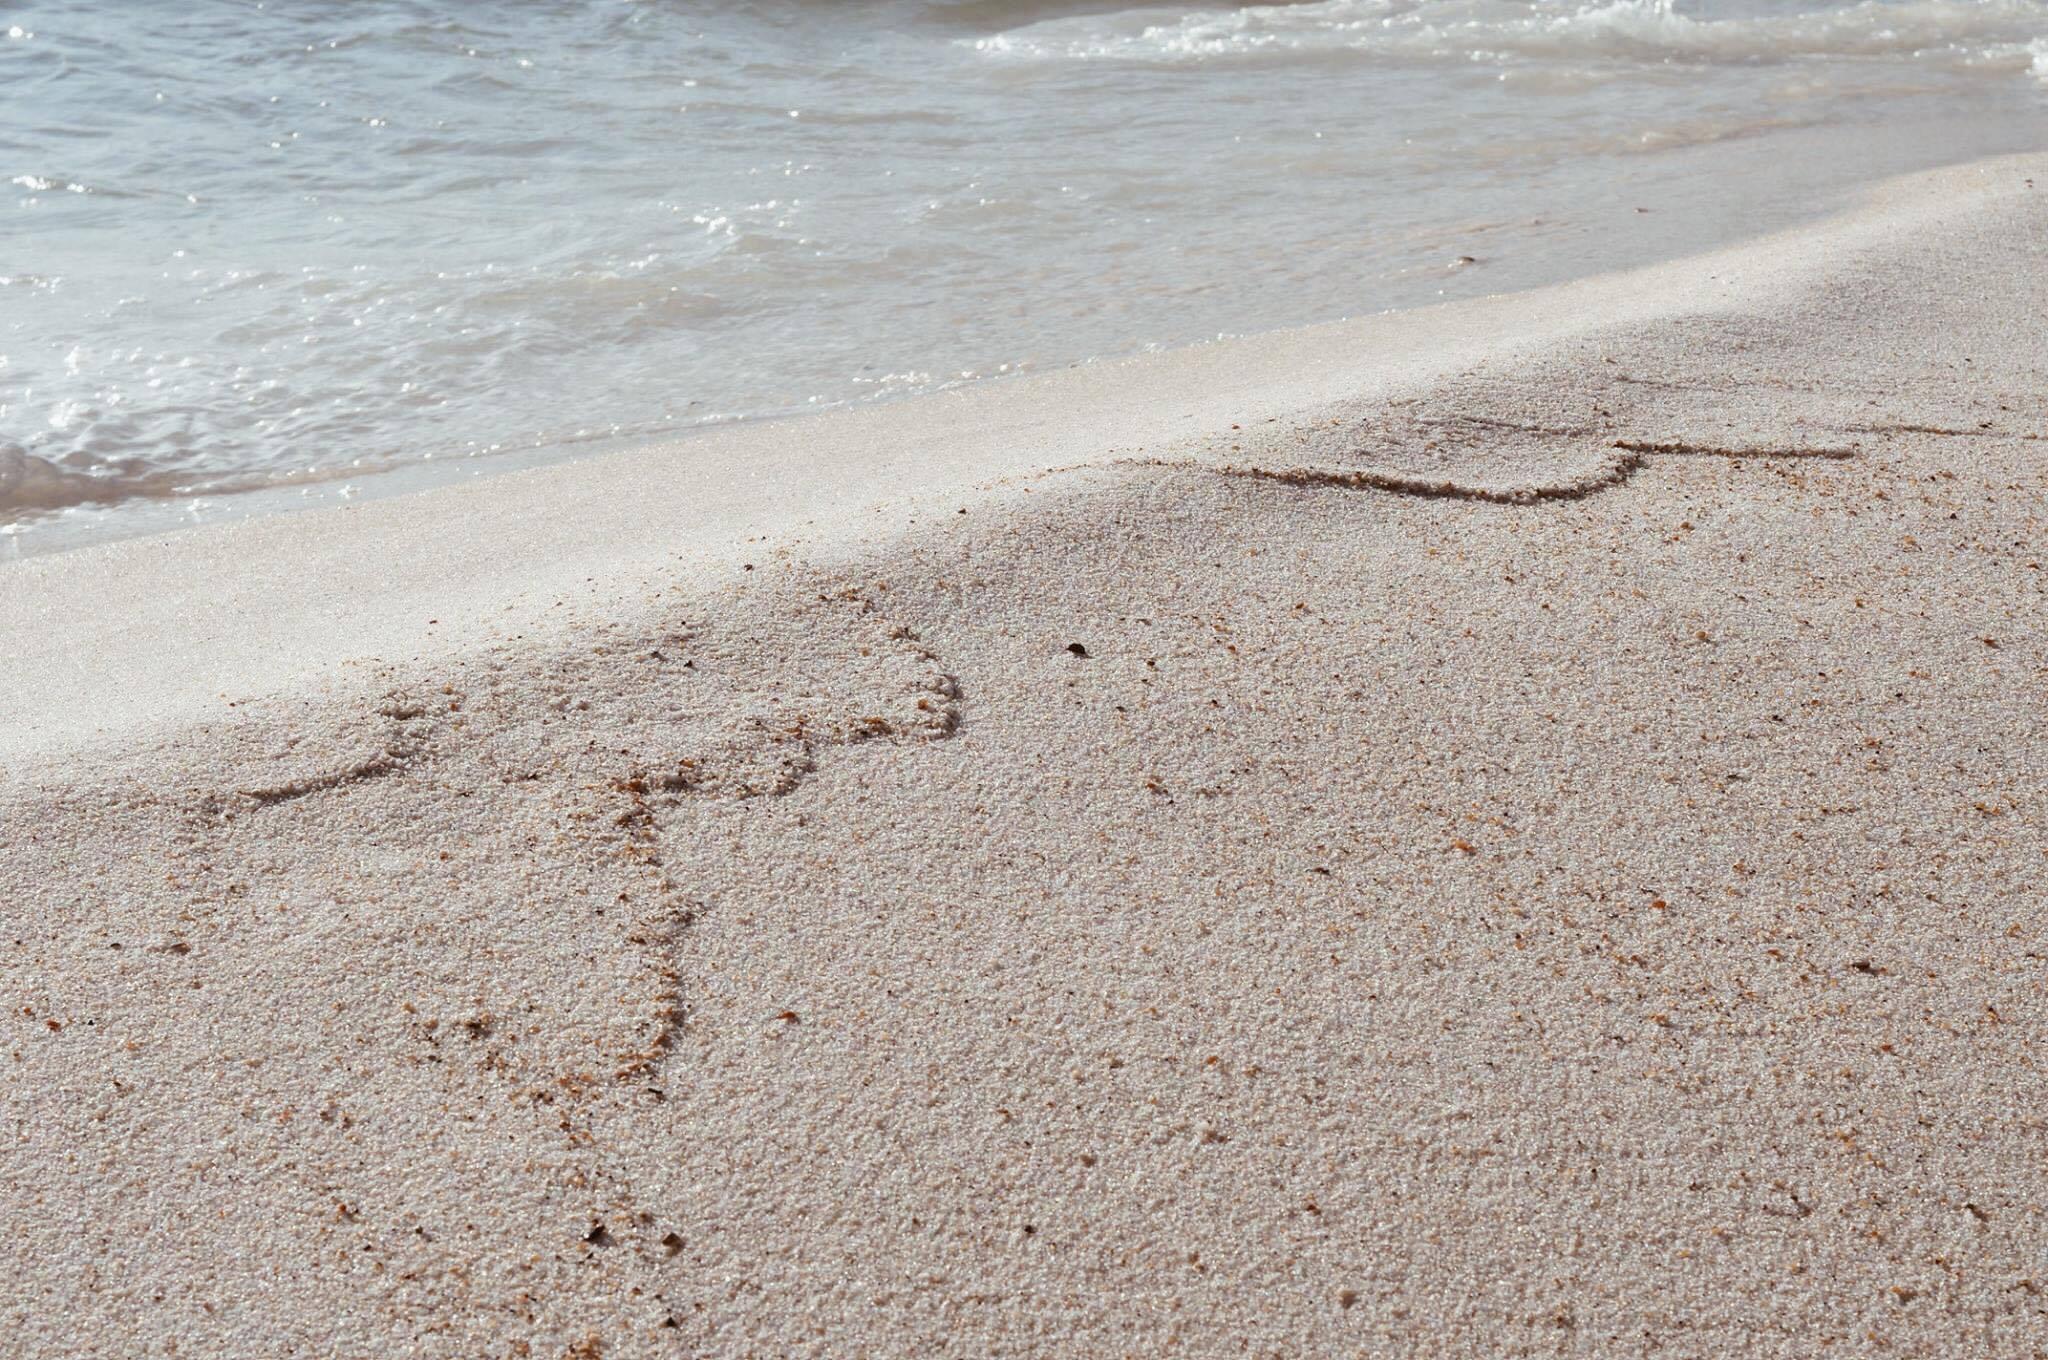 burcu_ozcan_chihuahua_mira_palmarina_palmalife_bodrum_yalikavak_palmalife_beach_burcuozcan_5